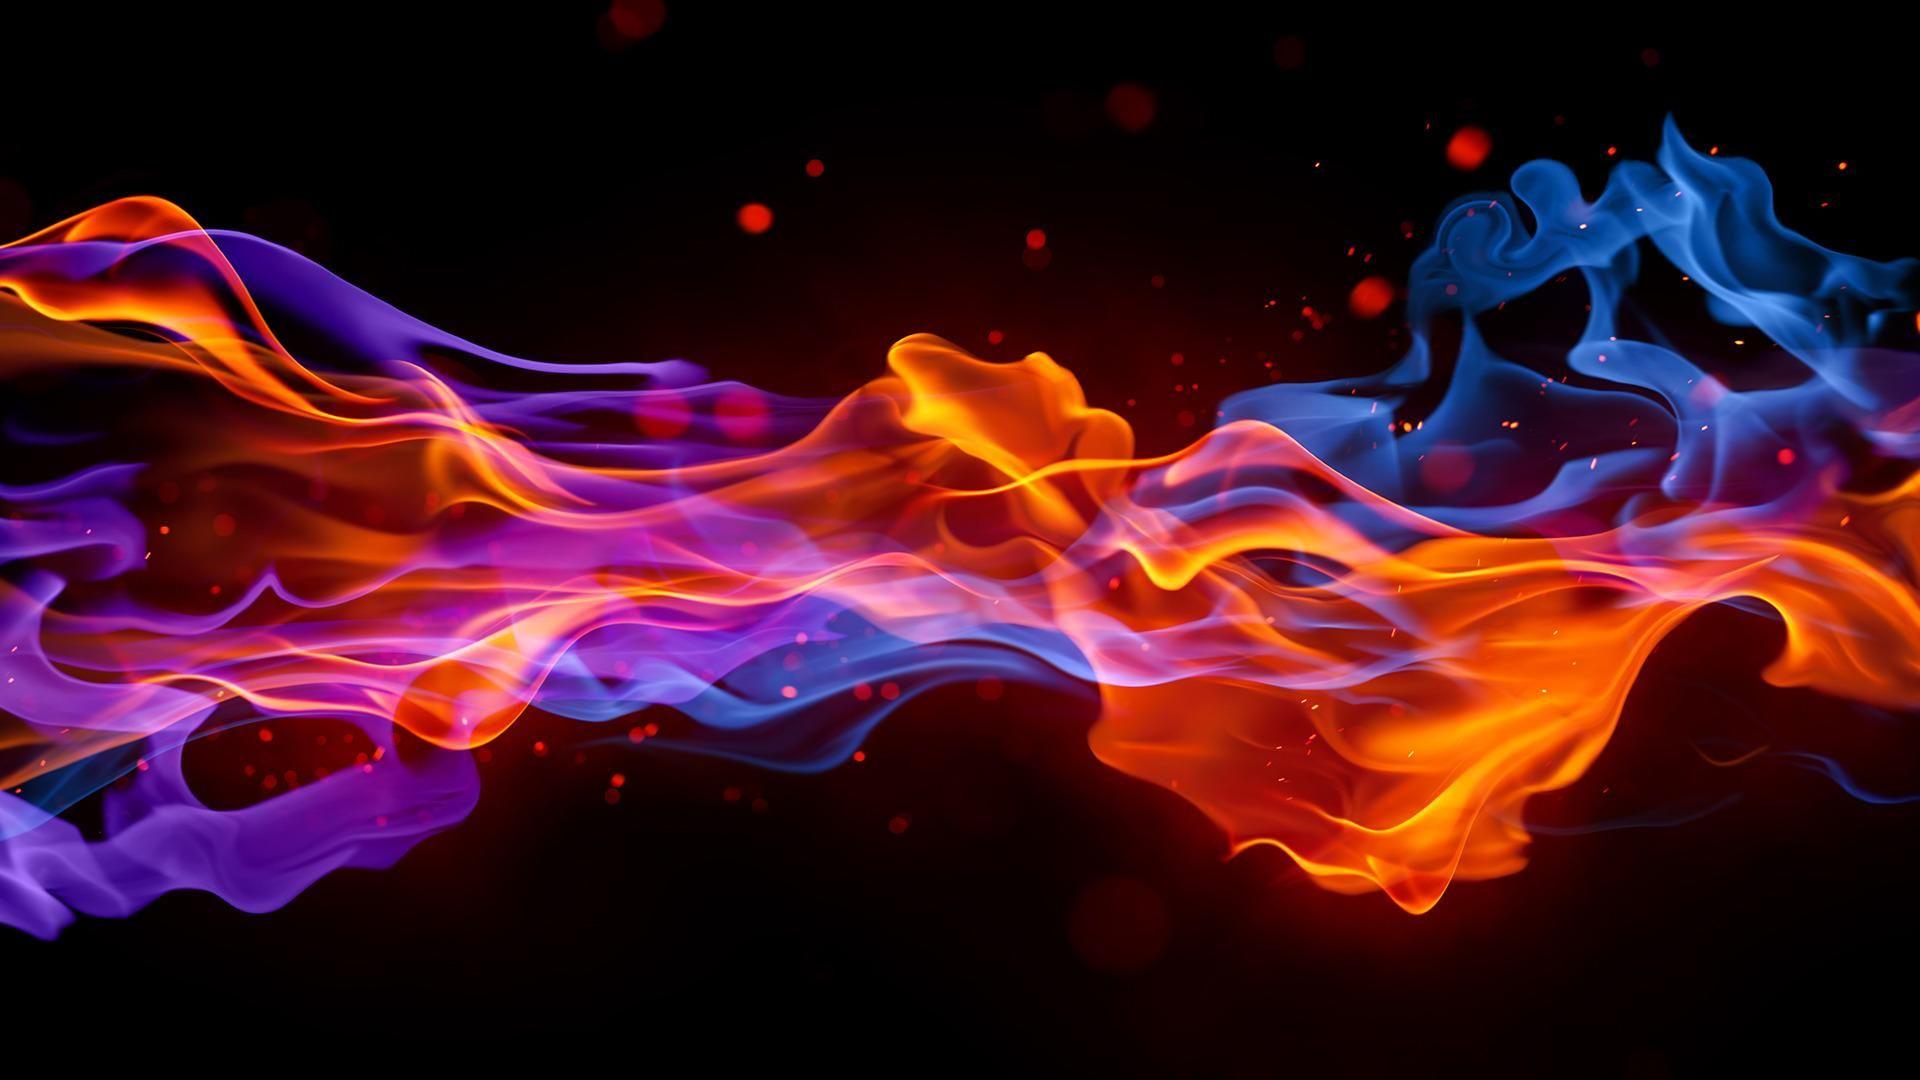 Description Free Download Orange Blue Flame Wallpaperdesktop